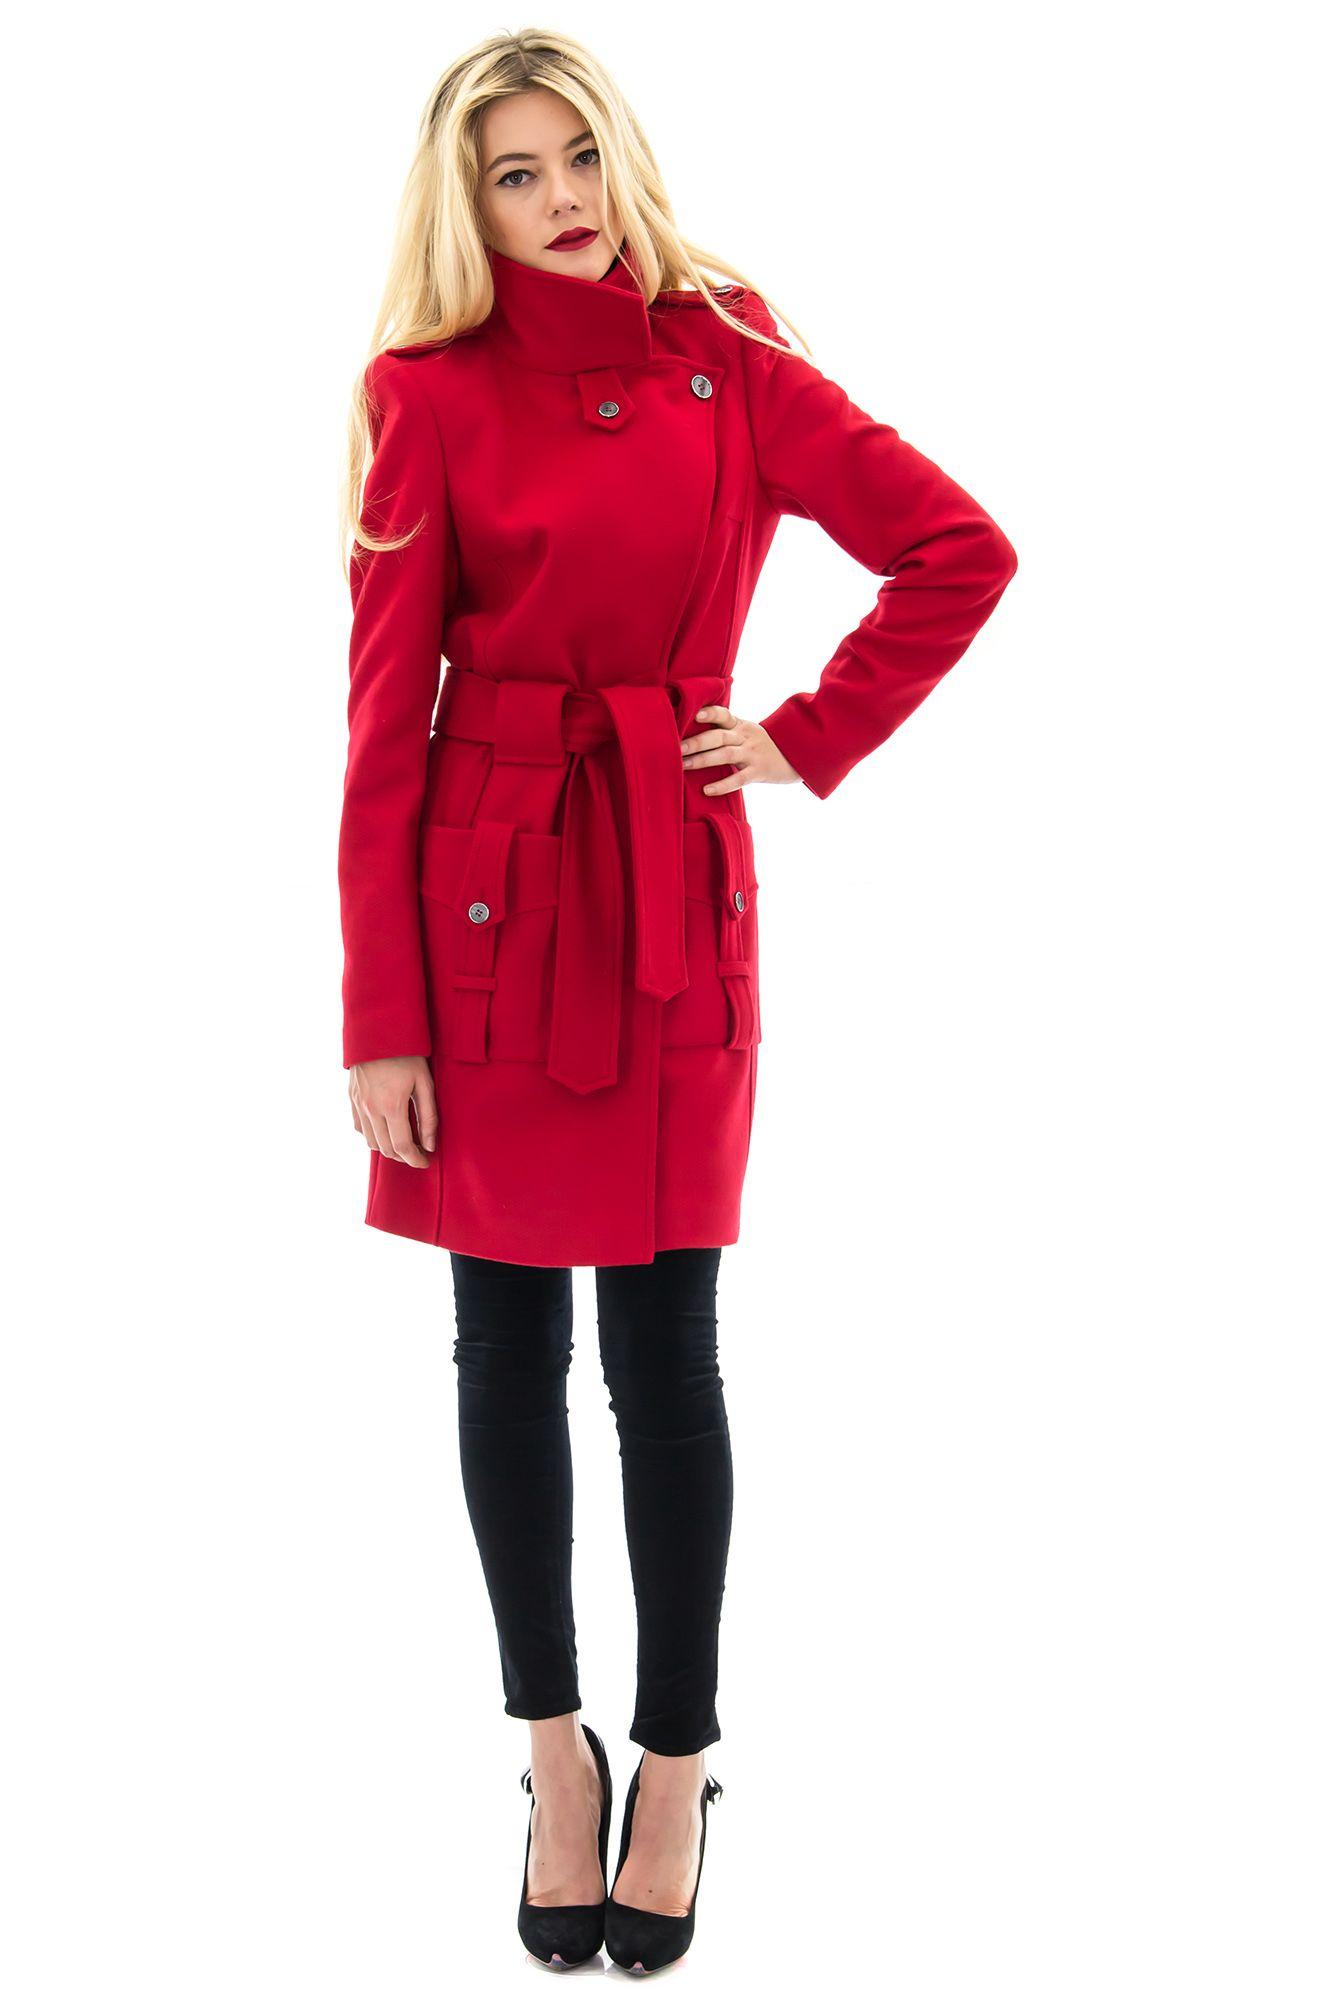 Manteau cachemire, manteau rouge, manteau mode, manteau femme - Stefanie  Renoma 22cf409b4f2